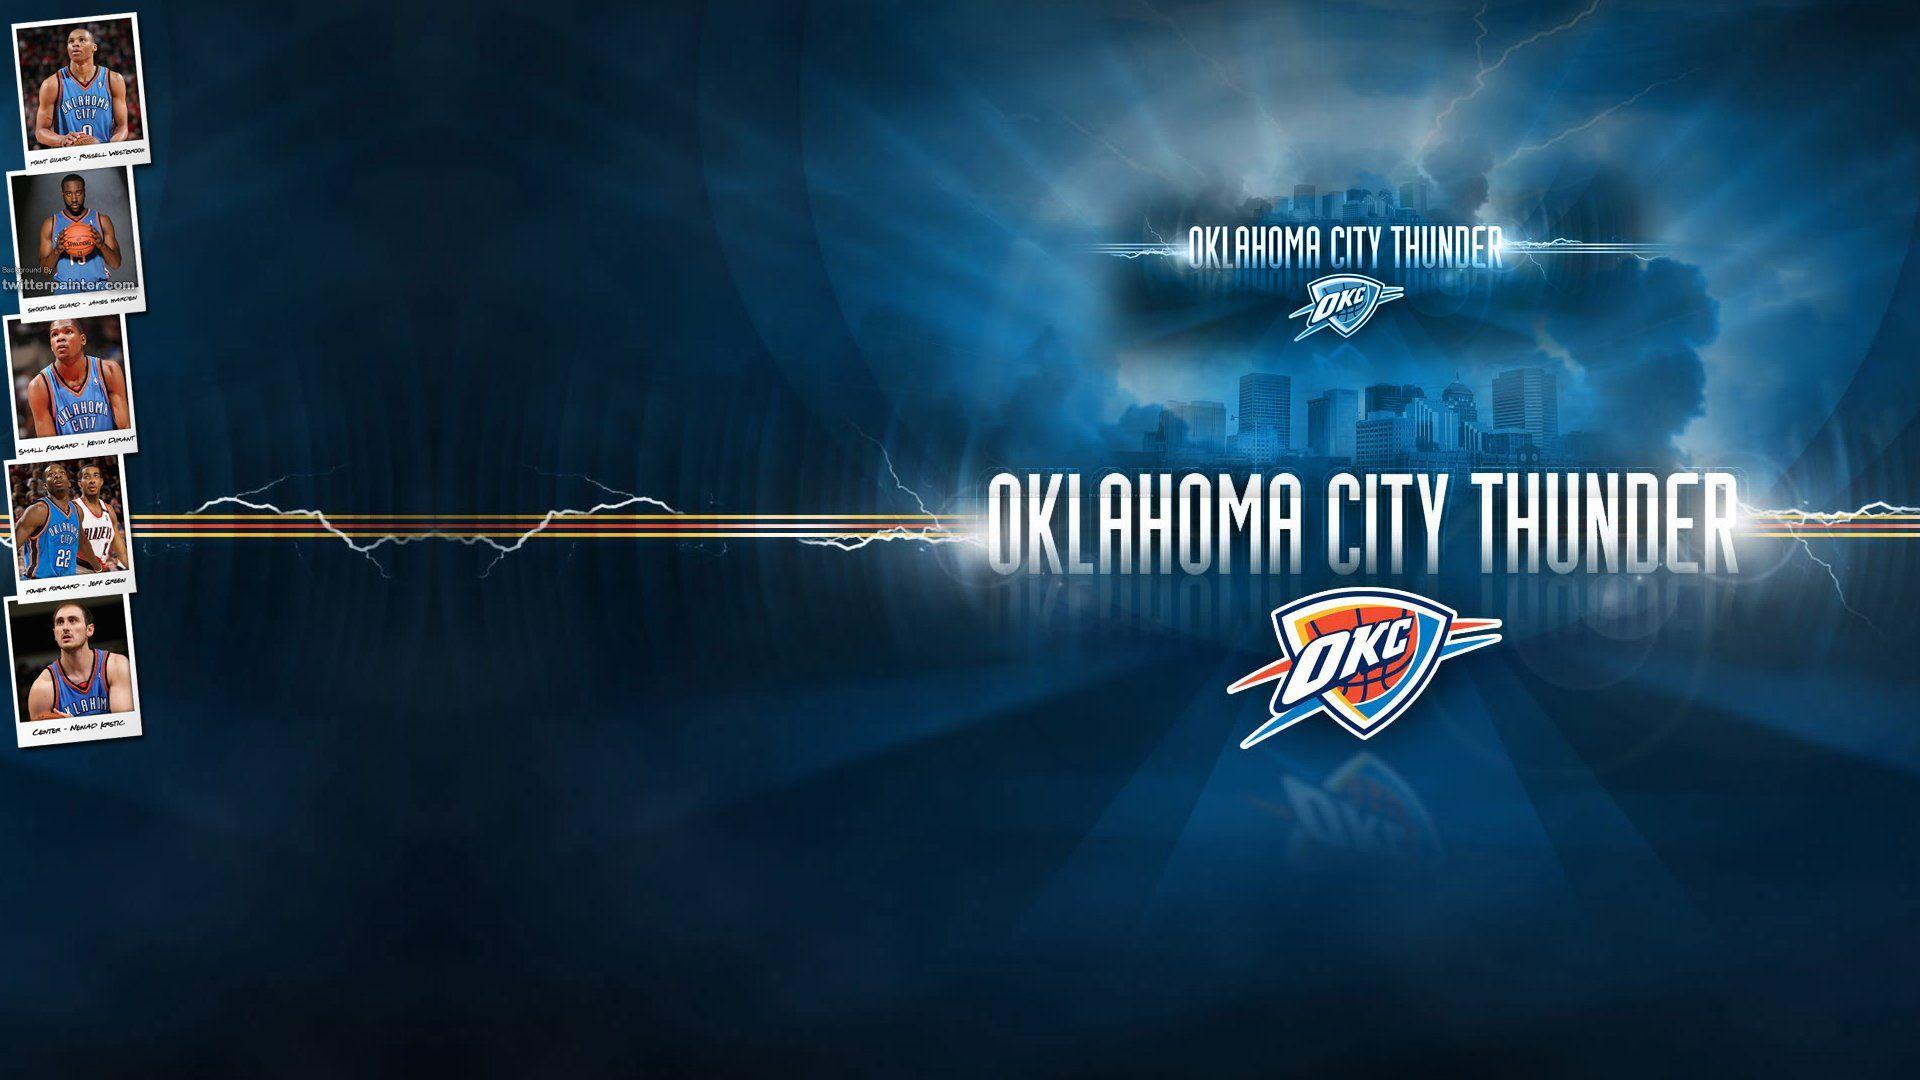 OKC Logo Wallpaper Free Download 900x675 Oklahoma Thunder Wallpapers 35